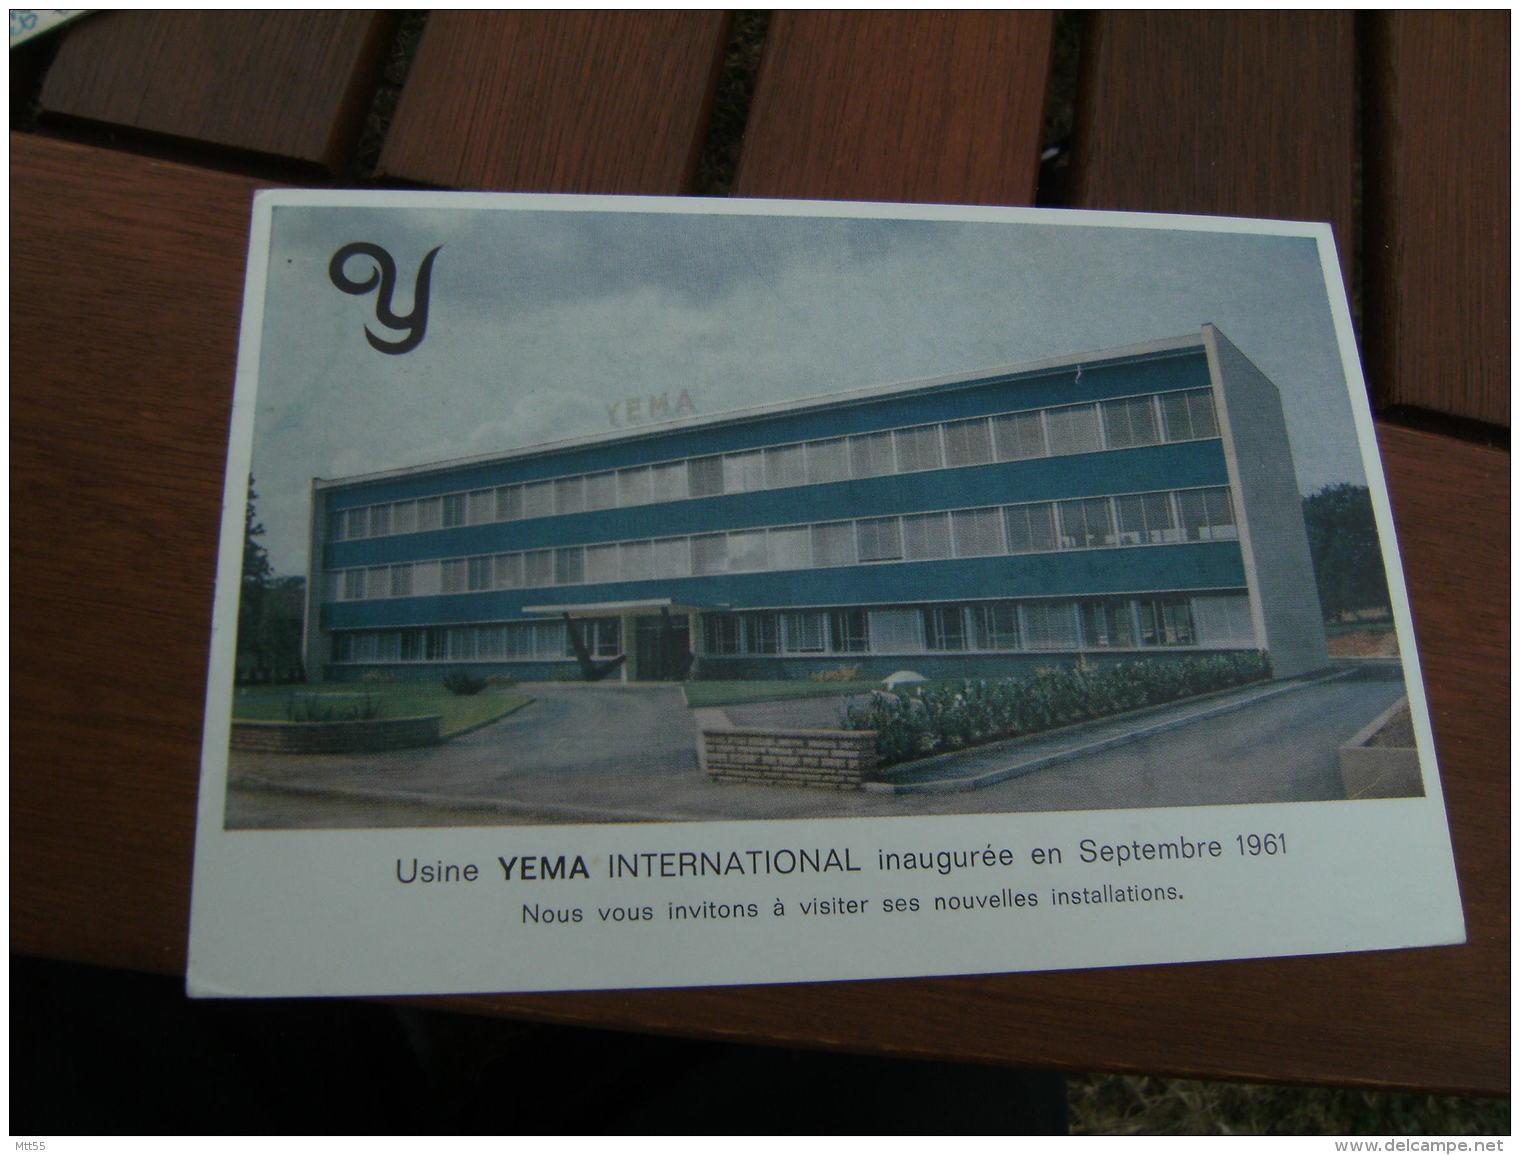 Usine Yema International Inauguree En Septembre 1961 Montre  Besancon - Besancon